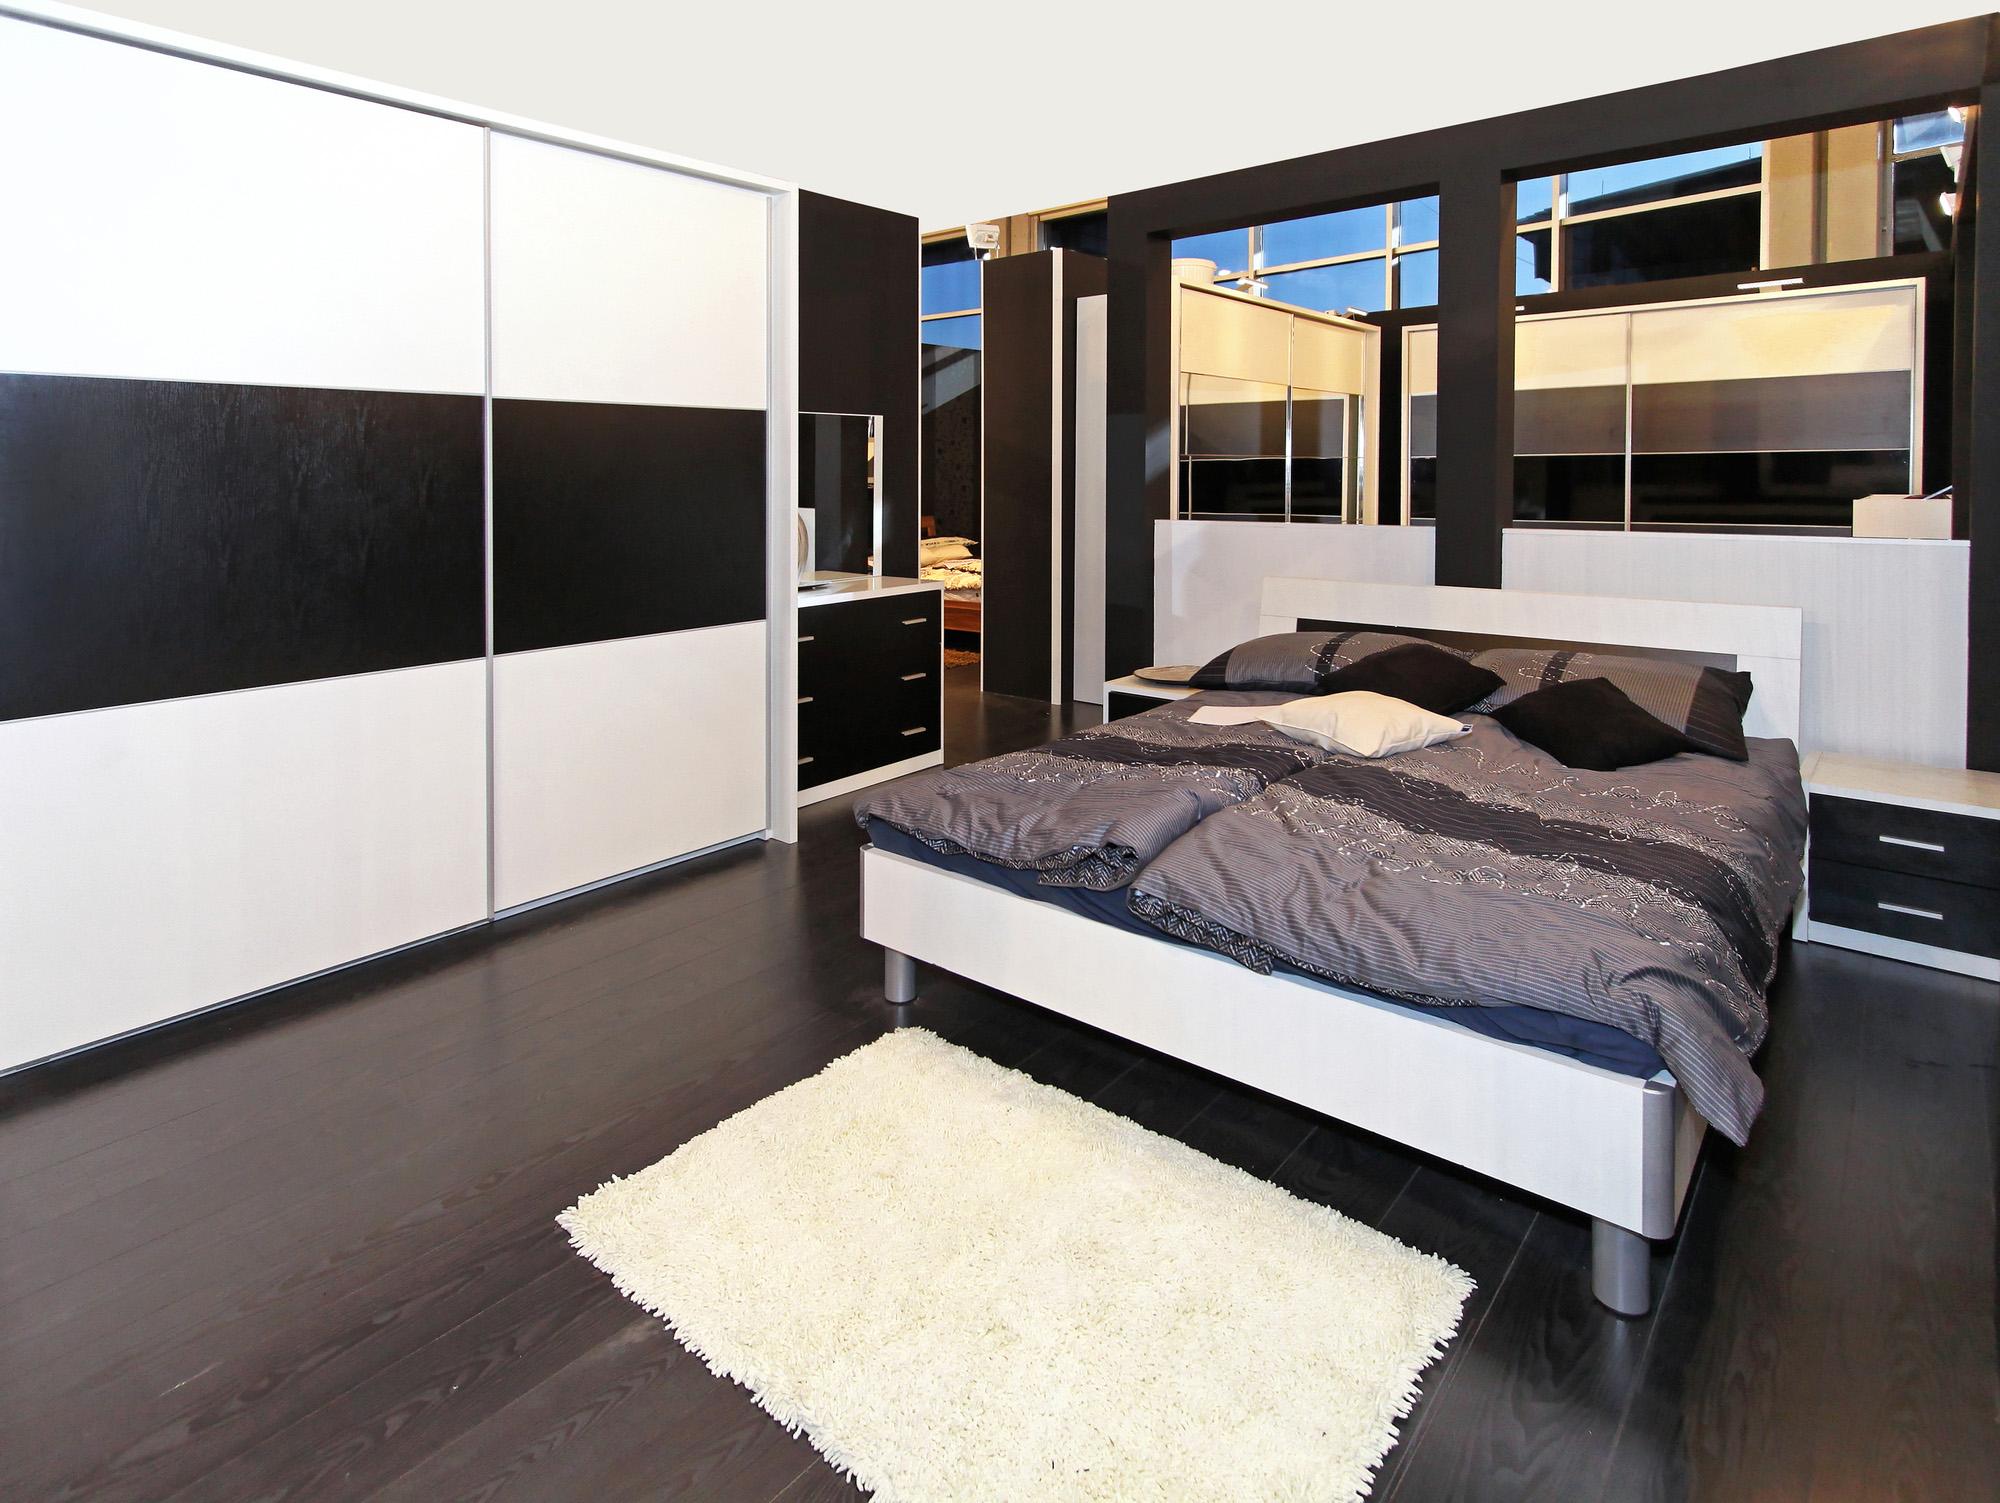 fitted sliding wardrobes, white wardrobe